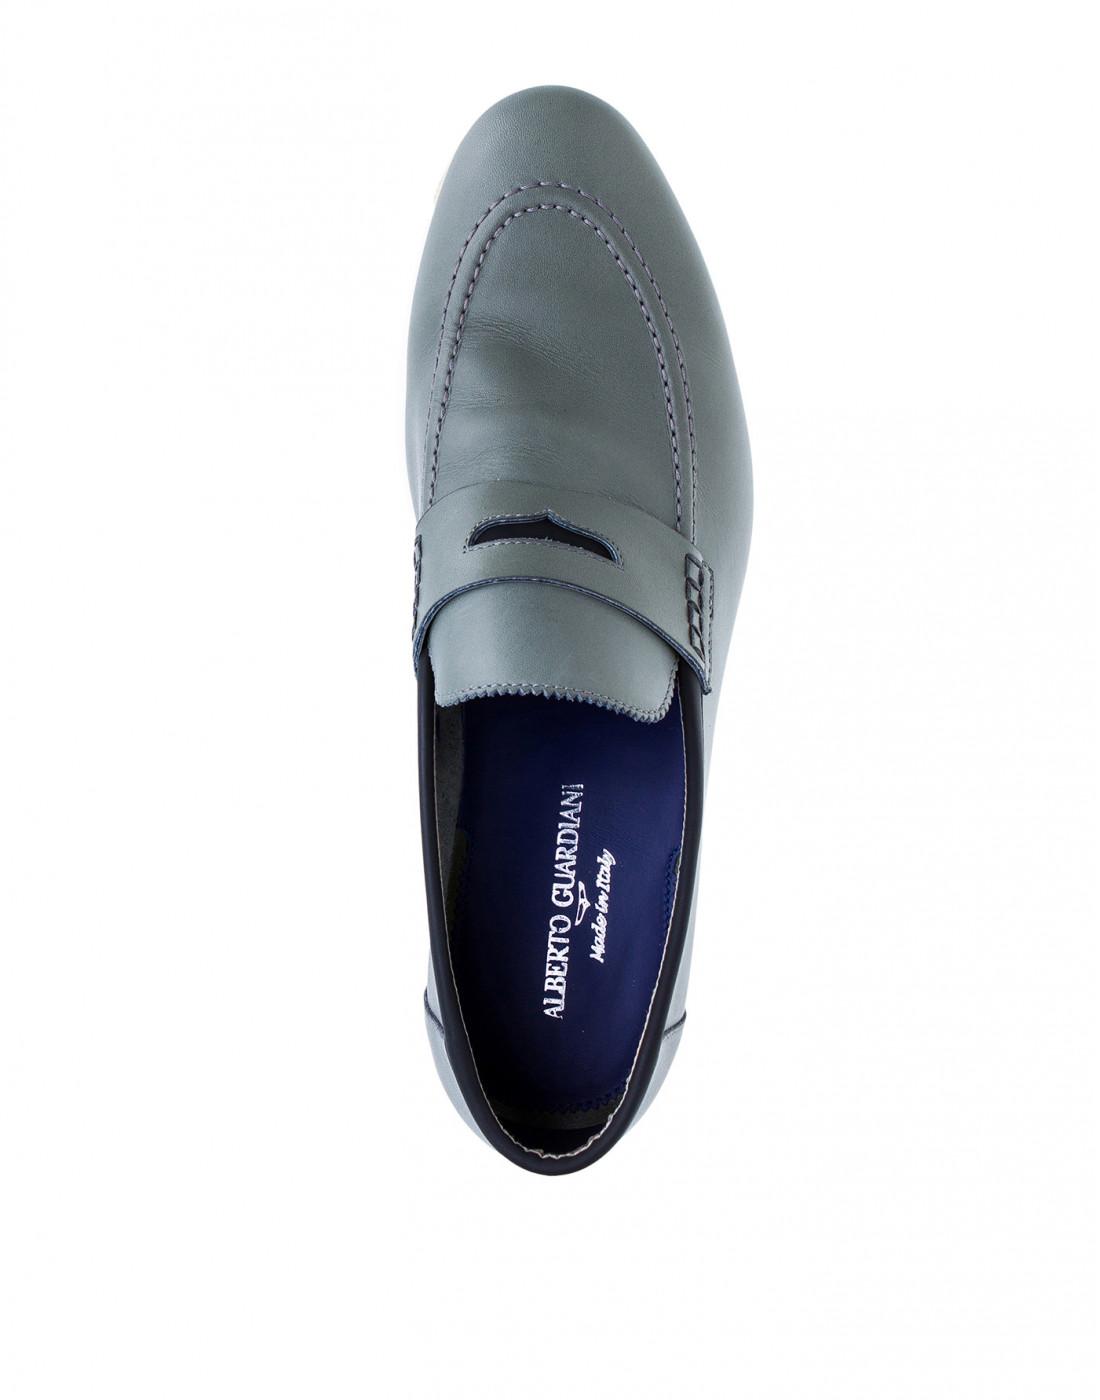 Туфли серые мужские A.Guardiani S76032S-5